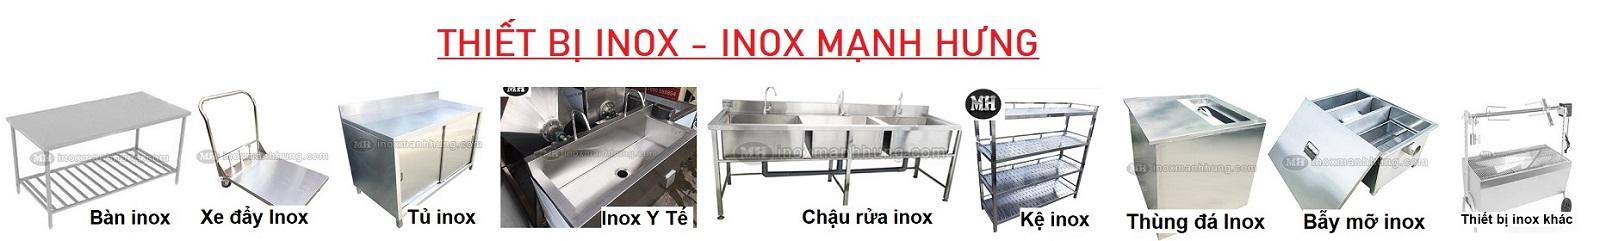 thiet-bi-inox-cong-nghiep